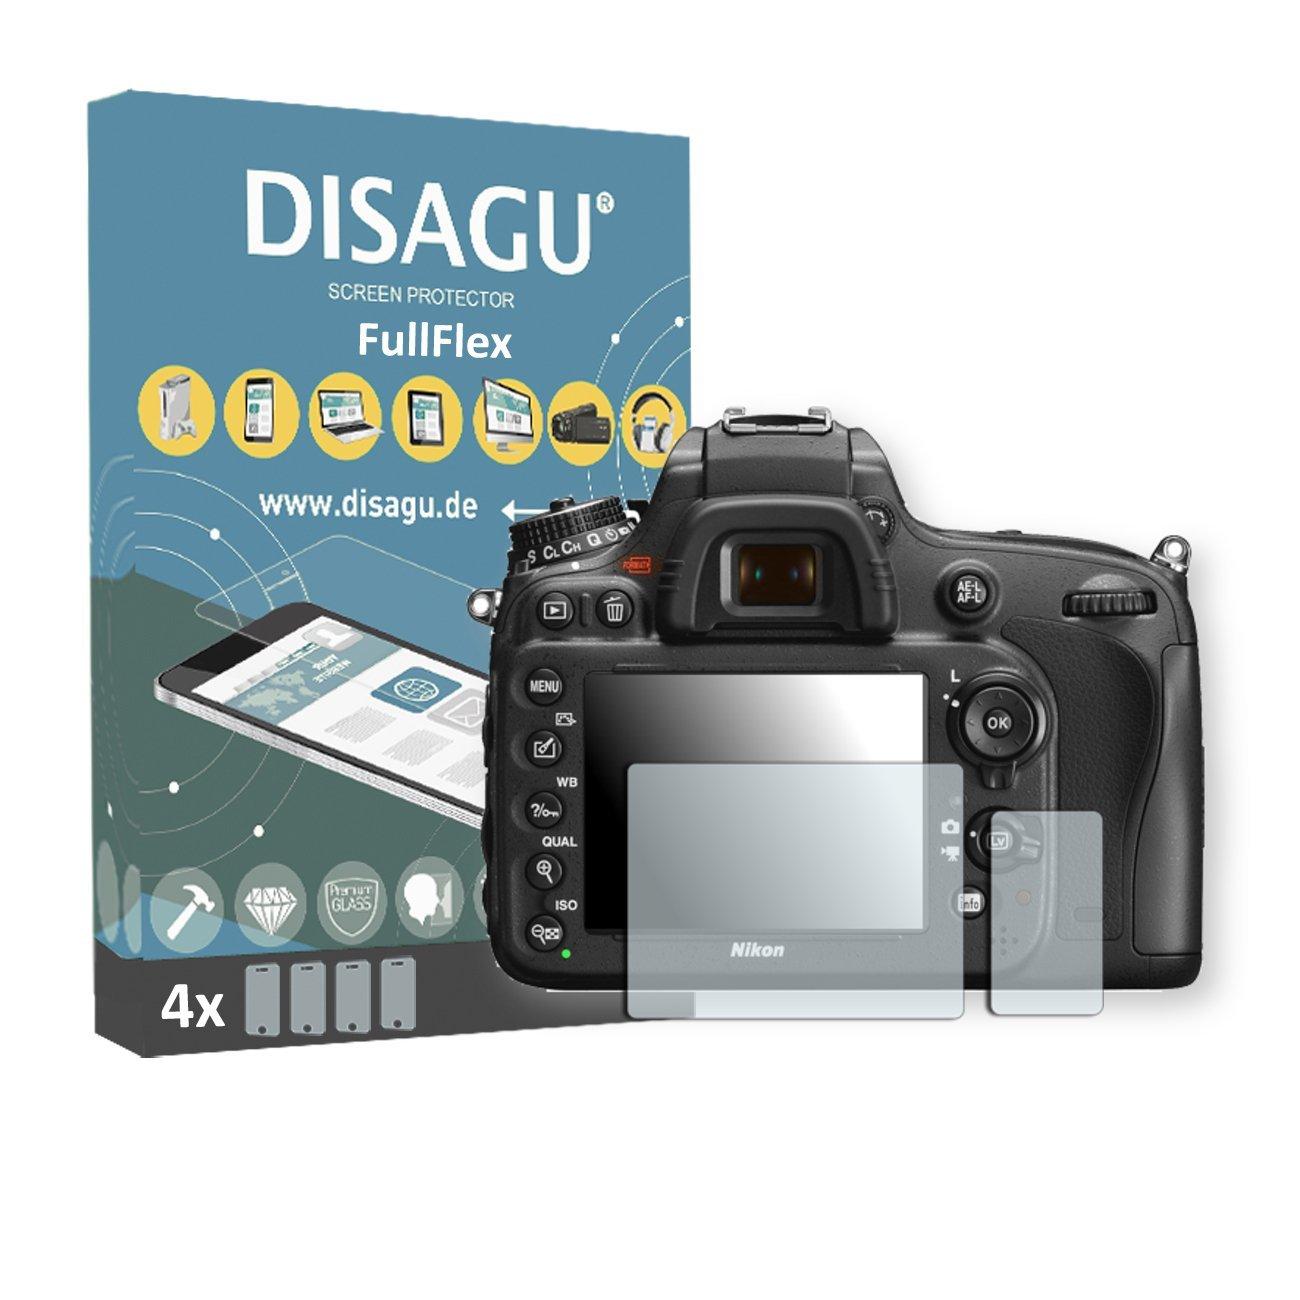 4 x Disagu FullFlex screen protector for Nikon D600 foil screen protector